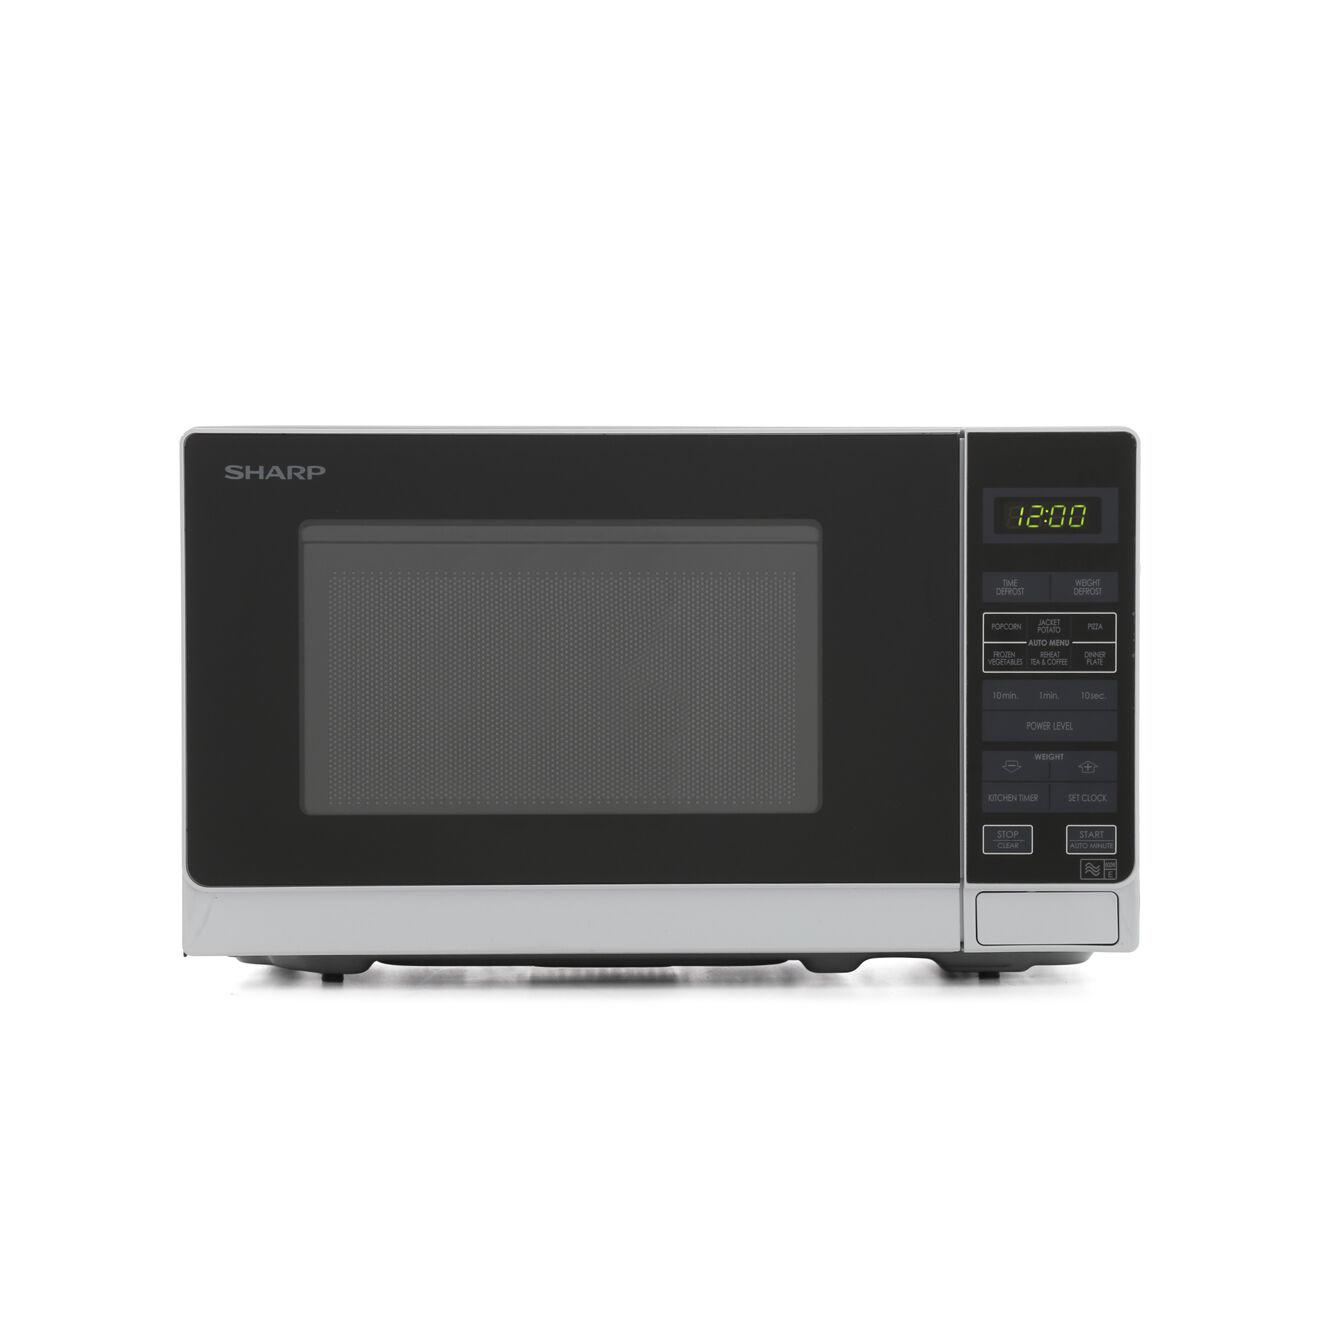 Sharp Microwave - White - R272WM